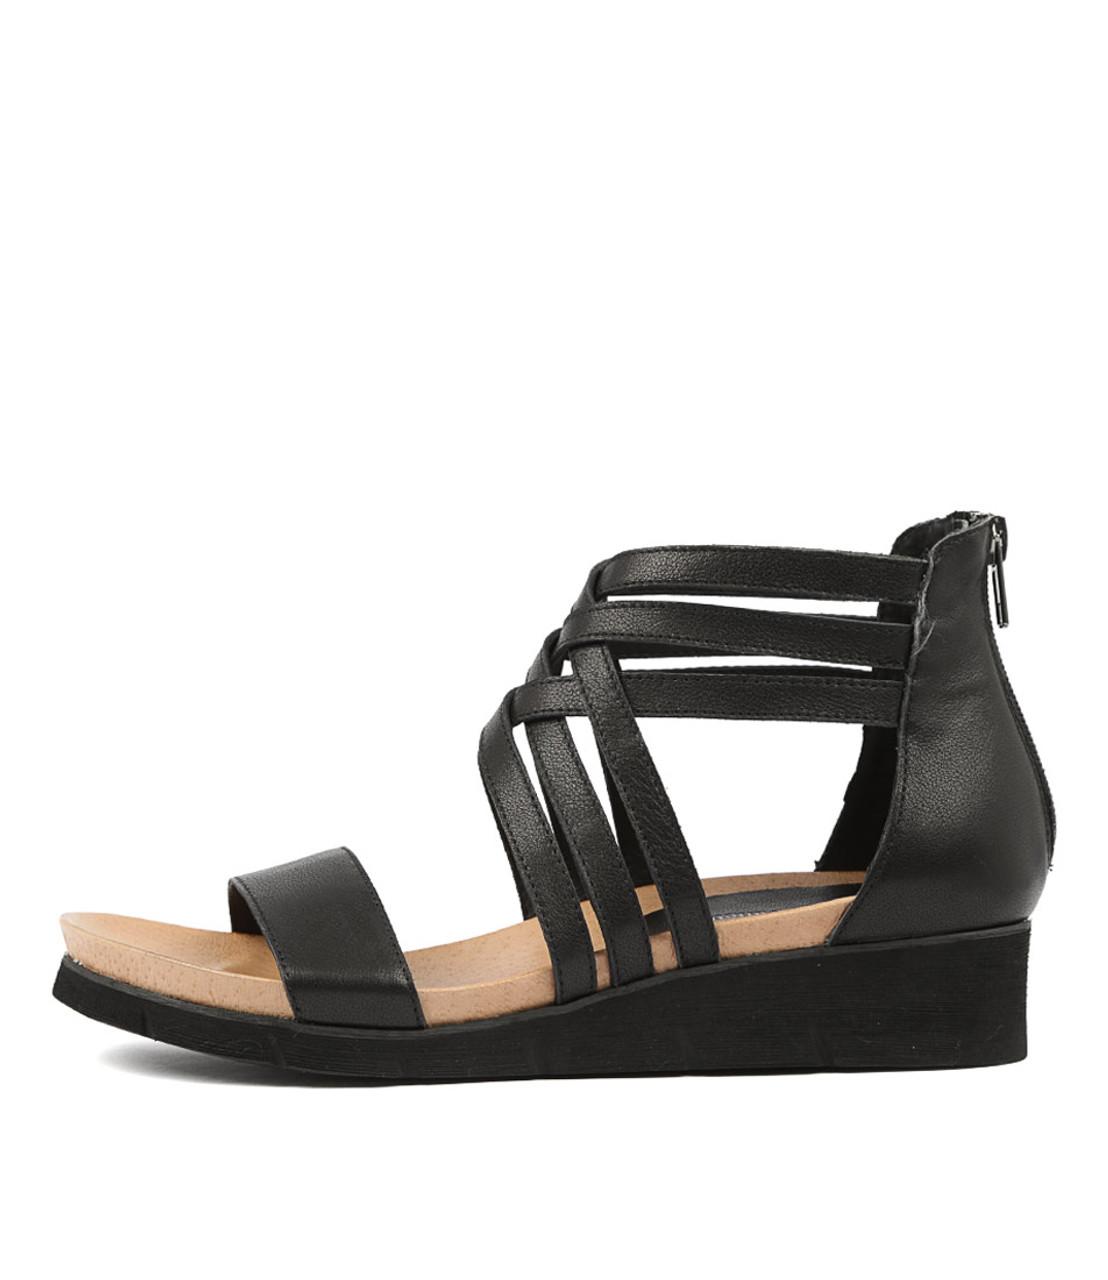 LUGOU Sandals Black Leather Django and Juliette